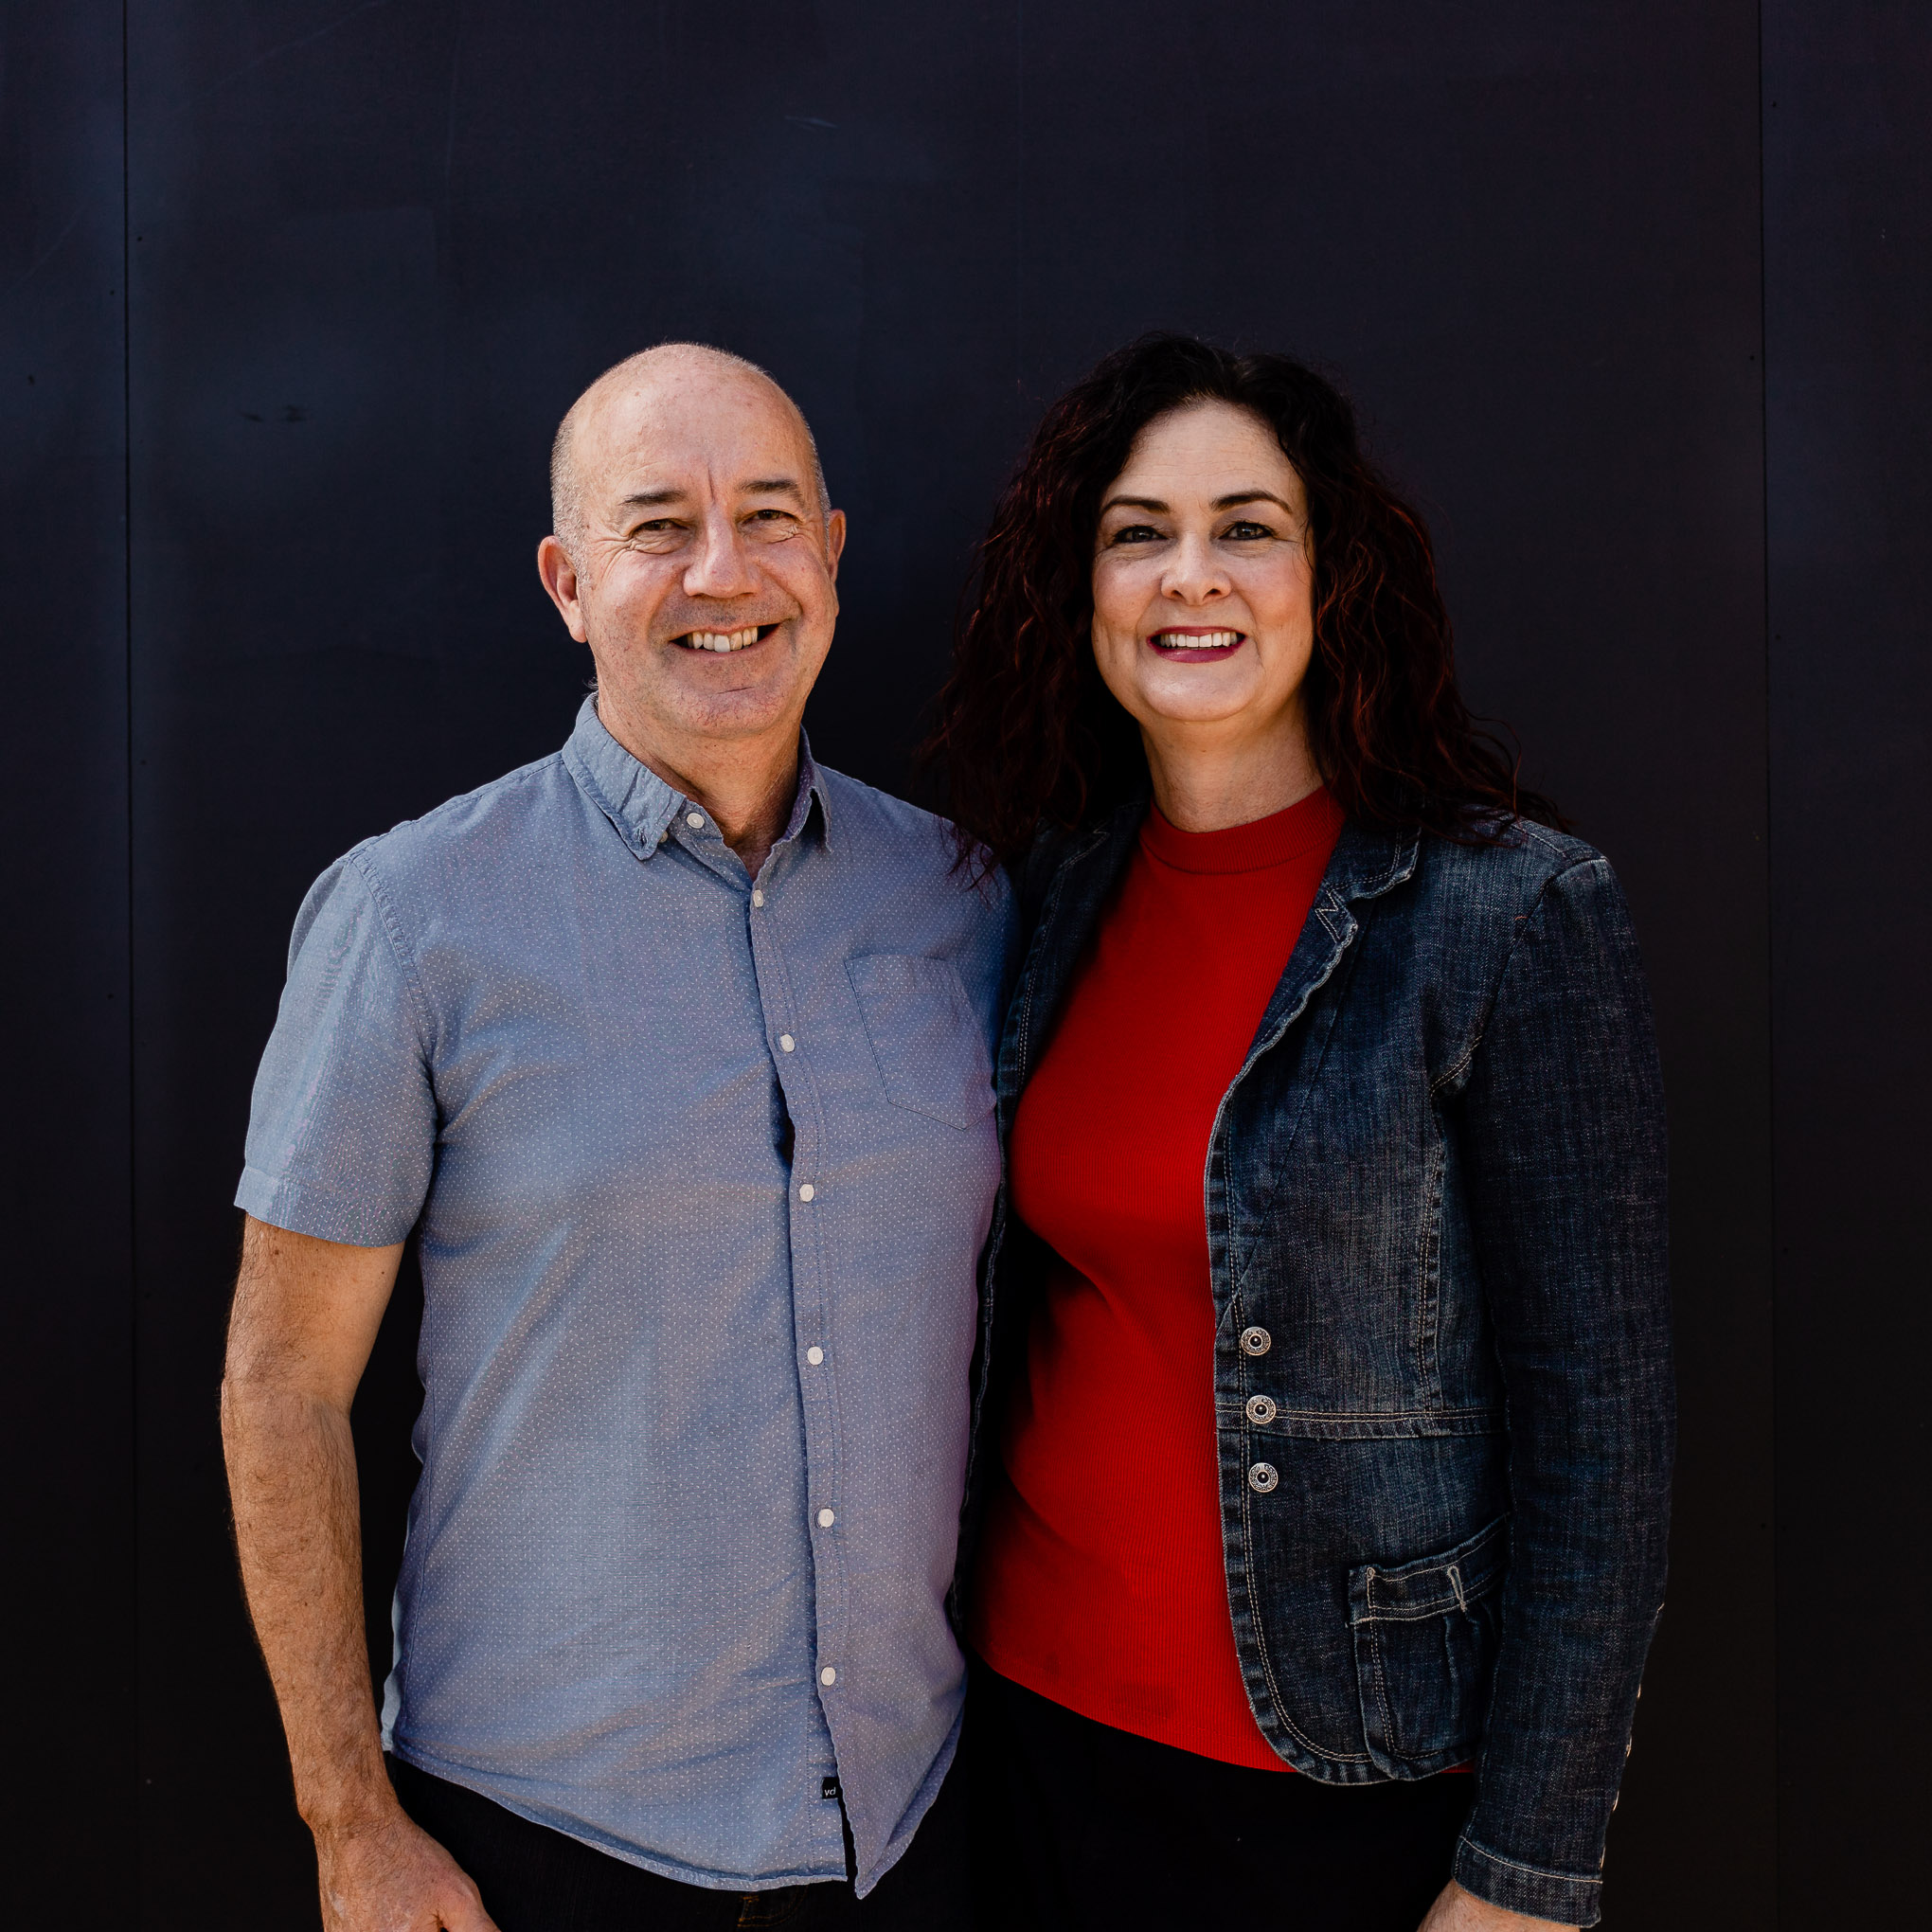 Steve & Nicole Meagher